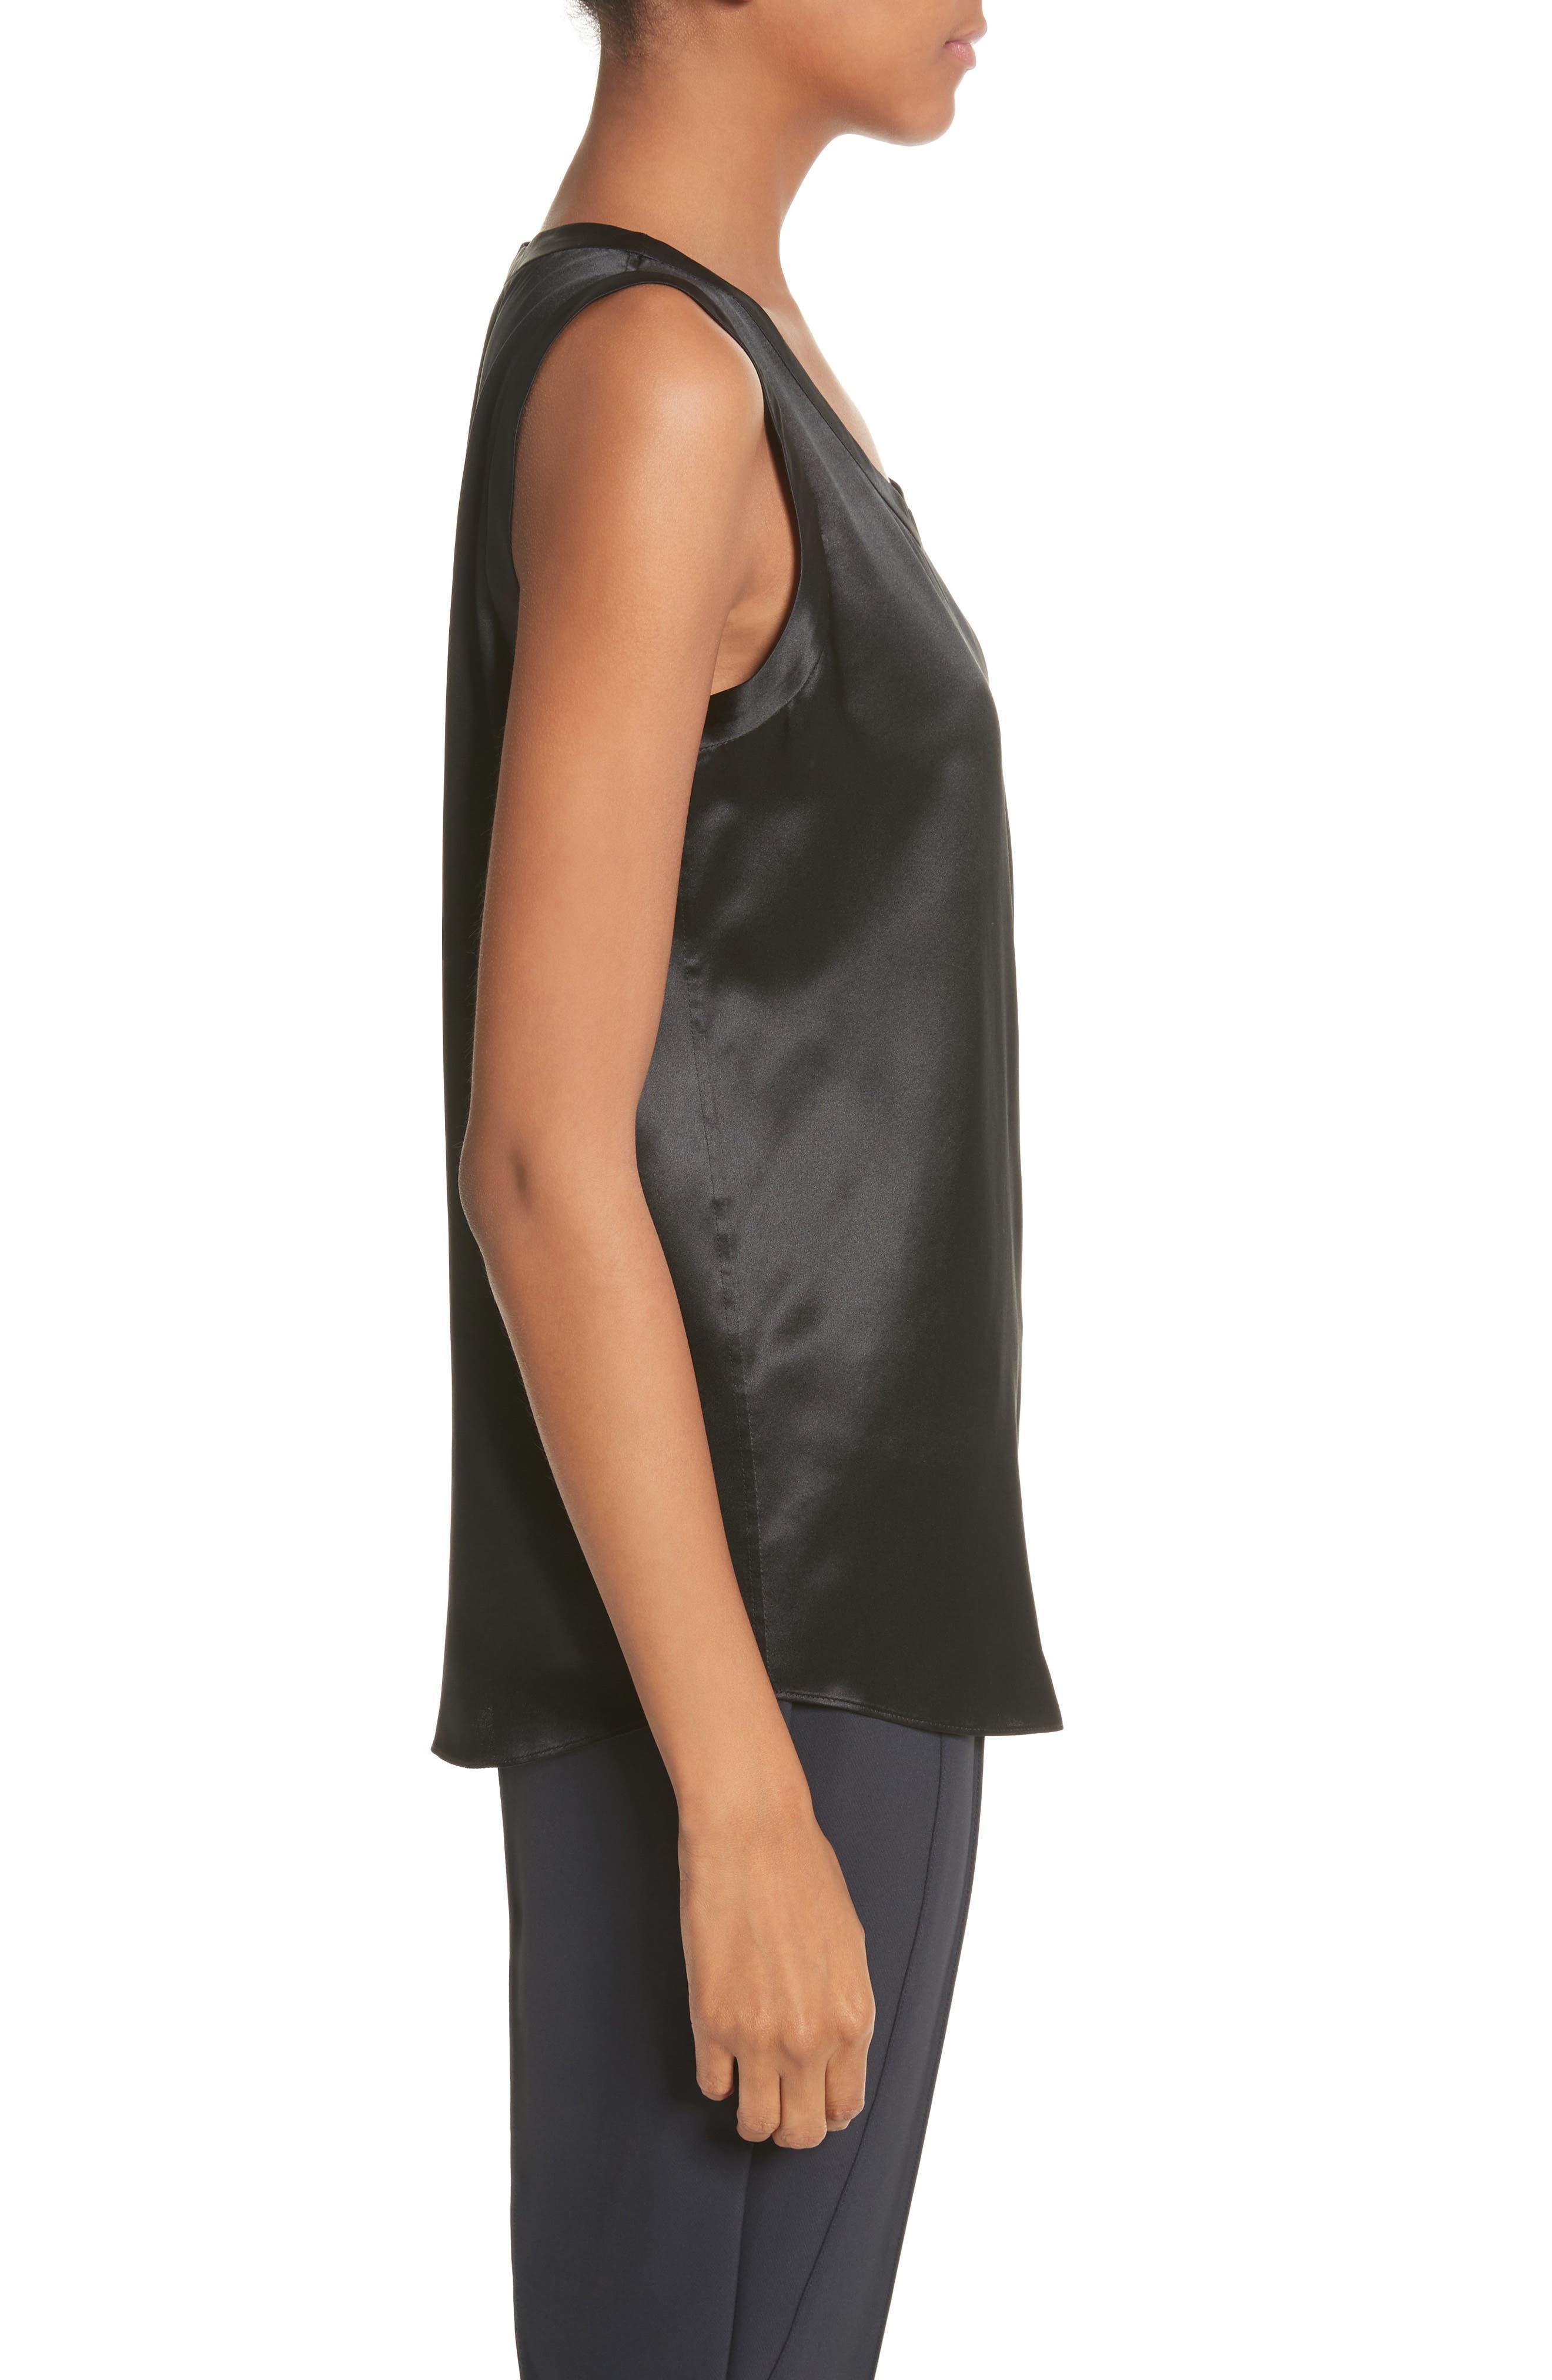 LAFAYETTE 148 NEW YORK, Perla Reversible Silk Blouse, Alternate thumbnail 3, color, BLACK